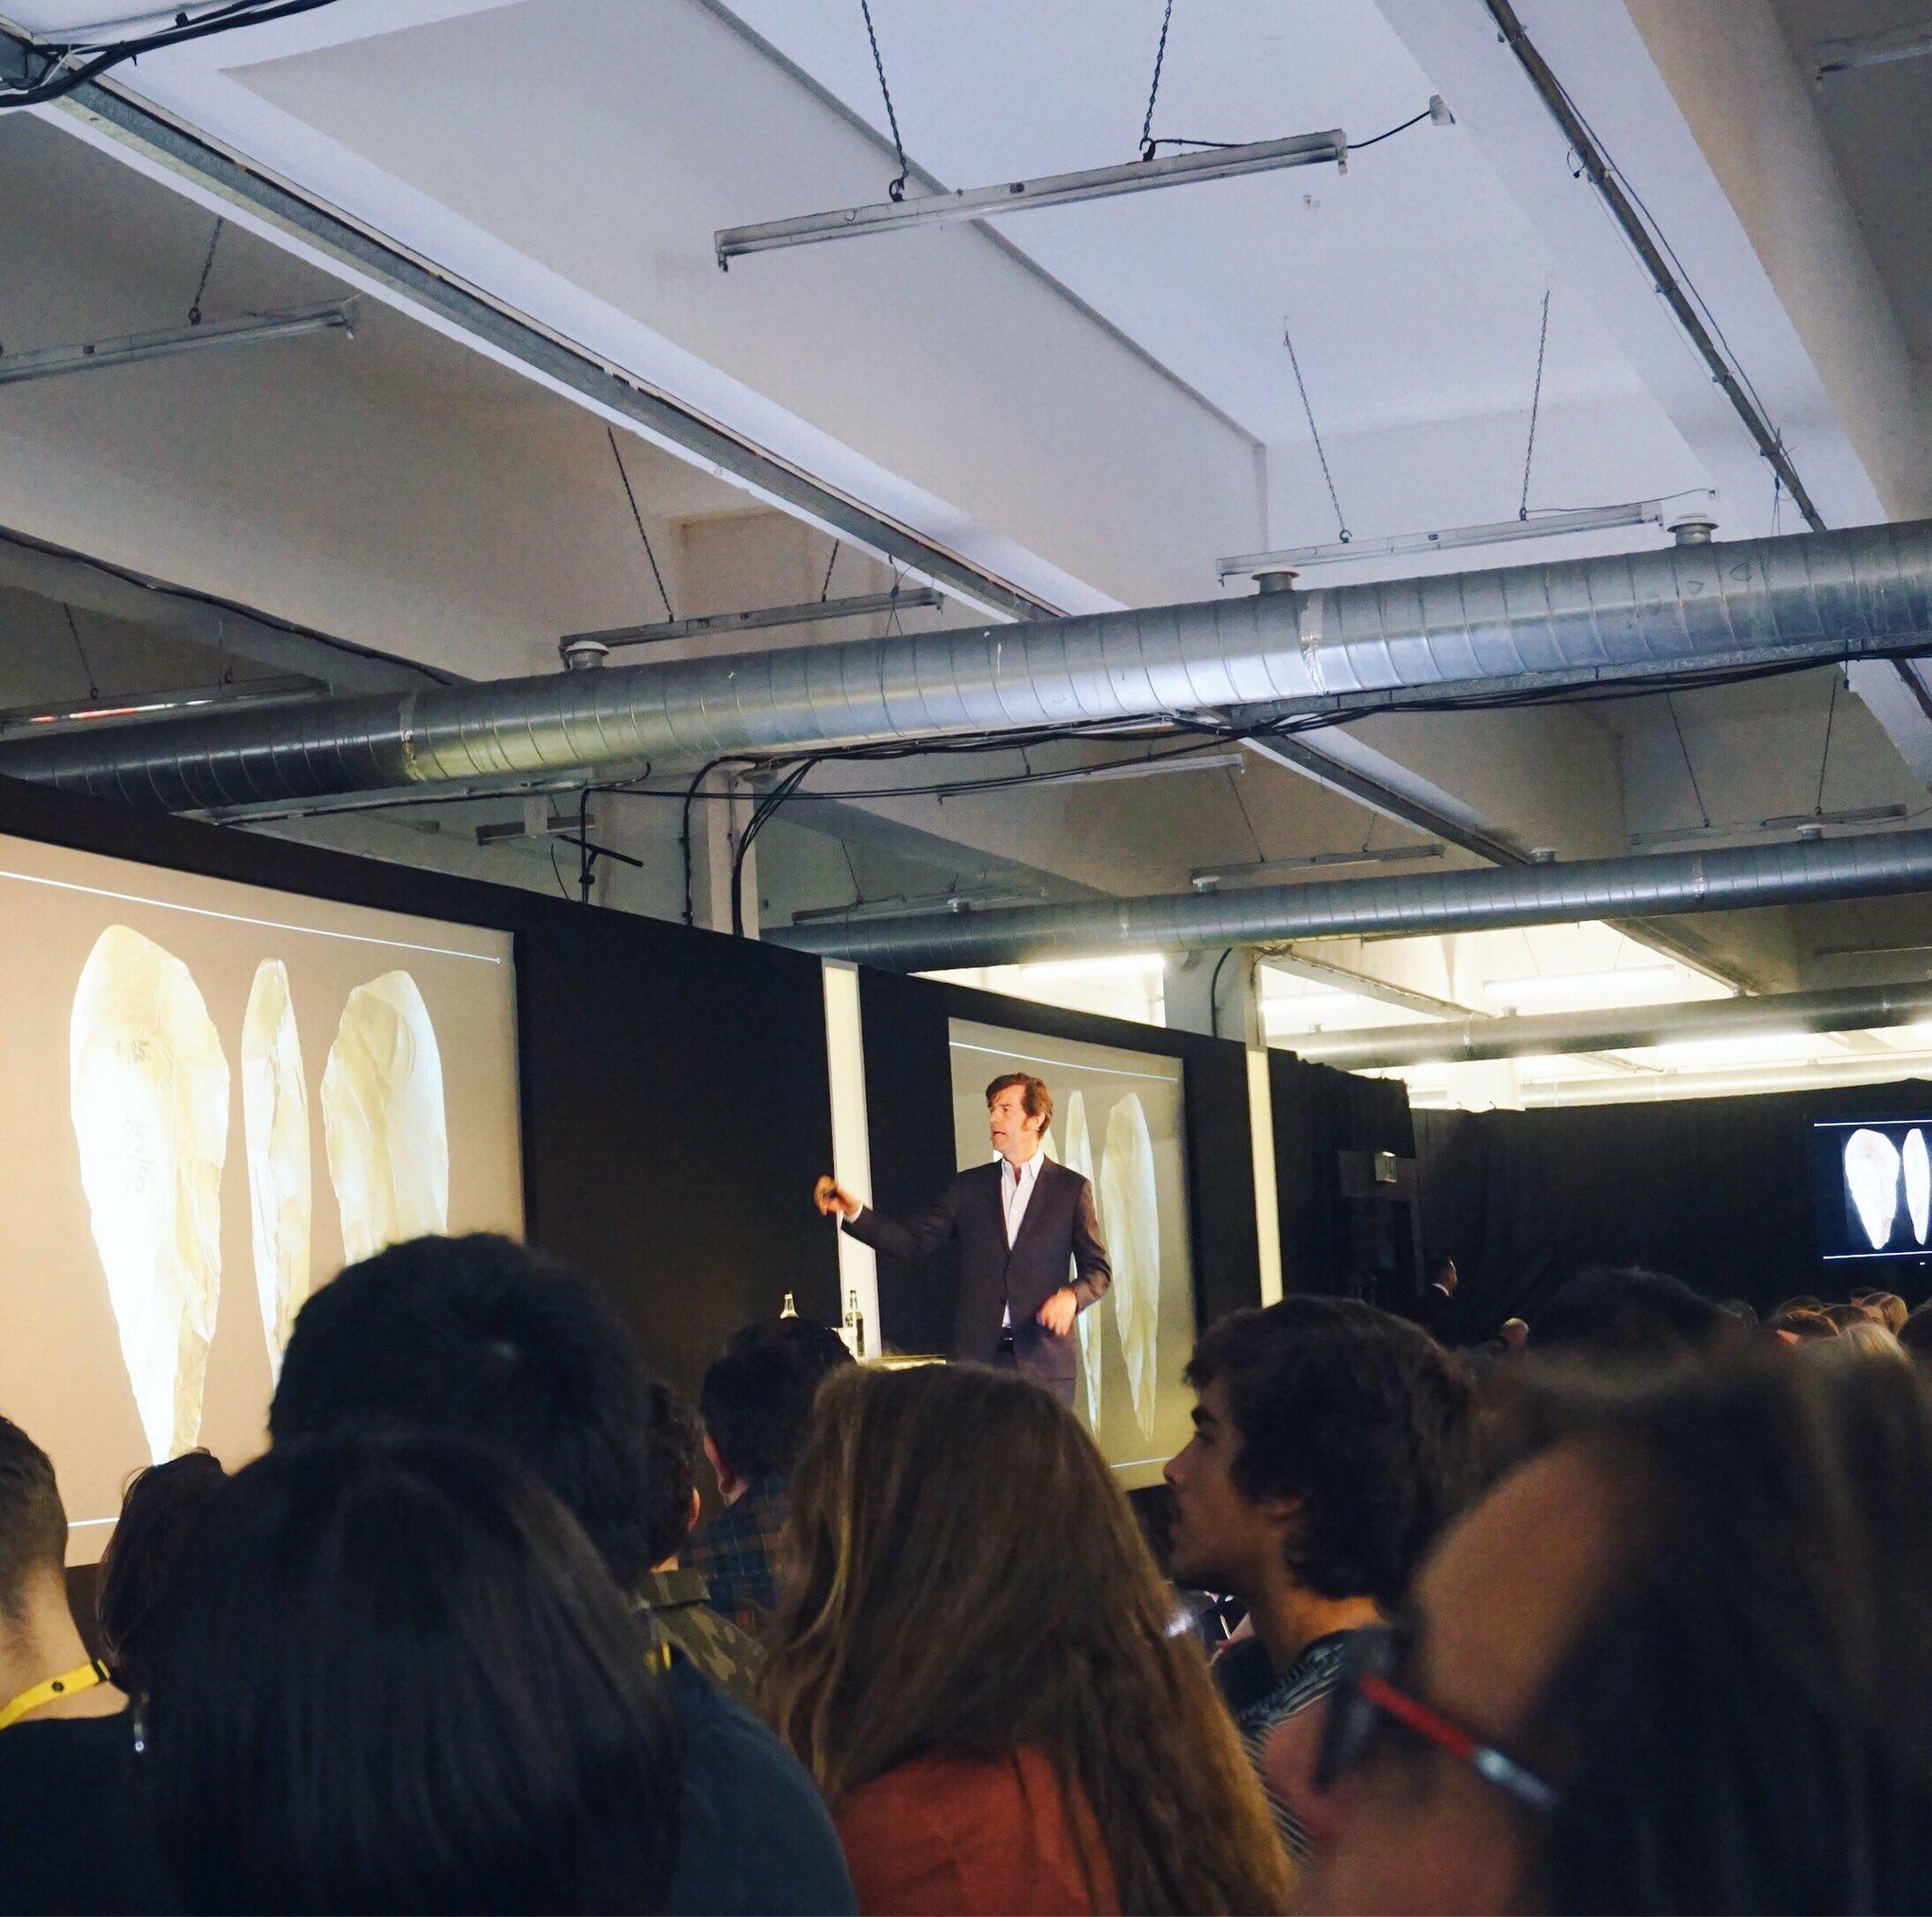 Stefan #Sagmeister on 'Why Beauty Matters' at @dandad. An incredible presentation! Informative yet interesting. #dandad17 #stefansagmeister https://t.co/HfEyxYryZ5